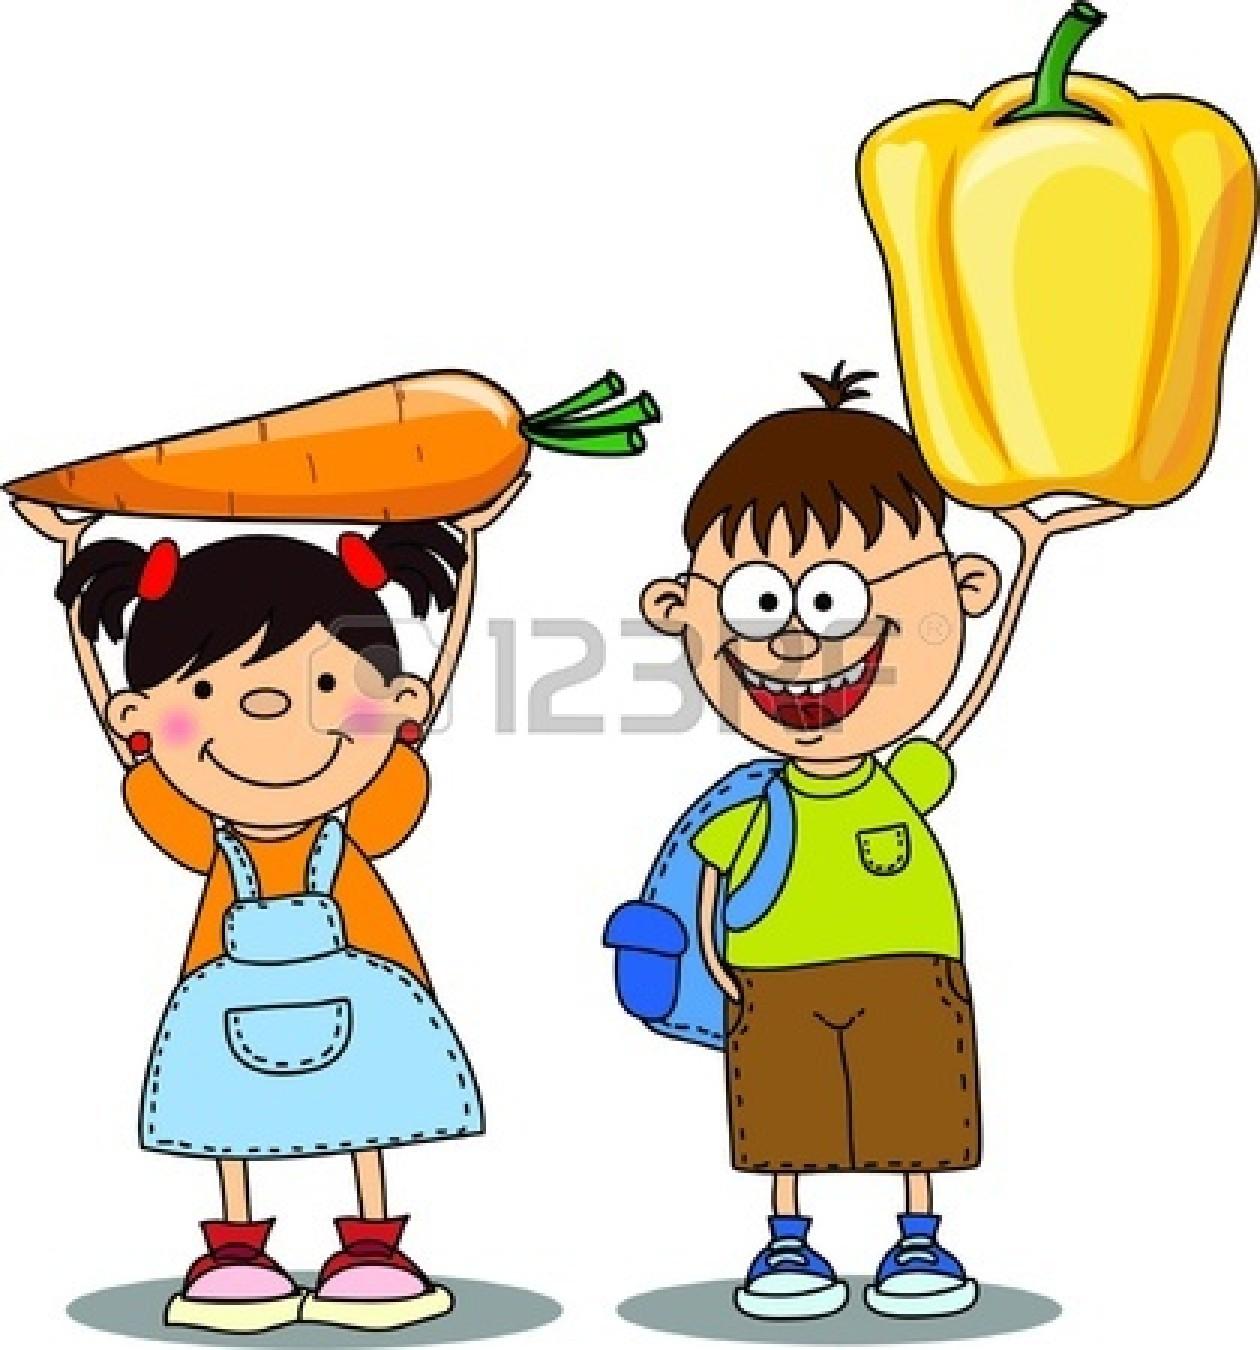 Vegetables Cartoon.